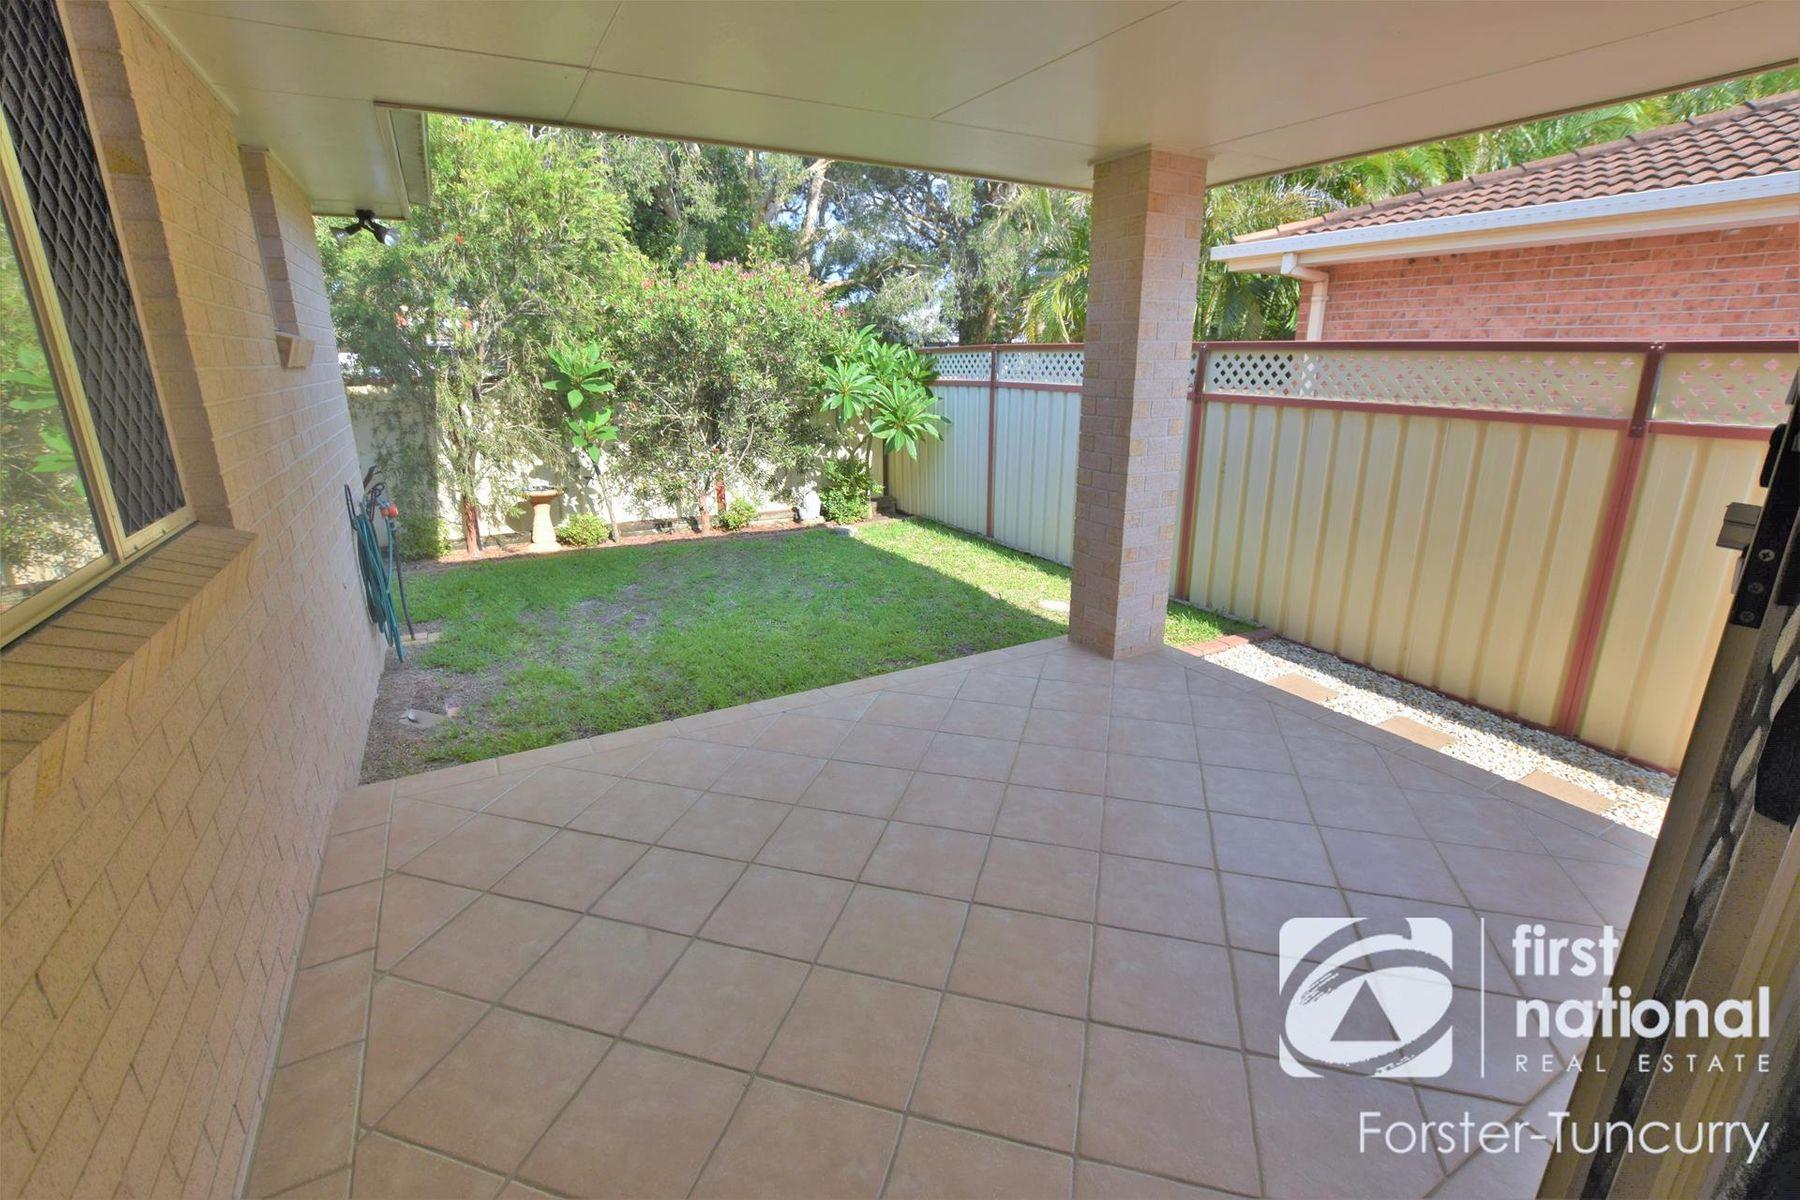 2/16 Parkes Street, Tuncurry, NSW 2428